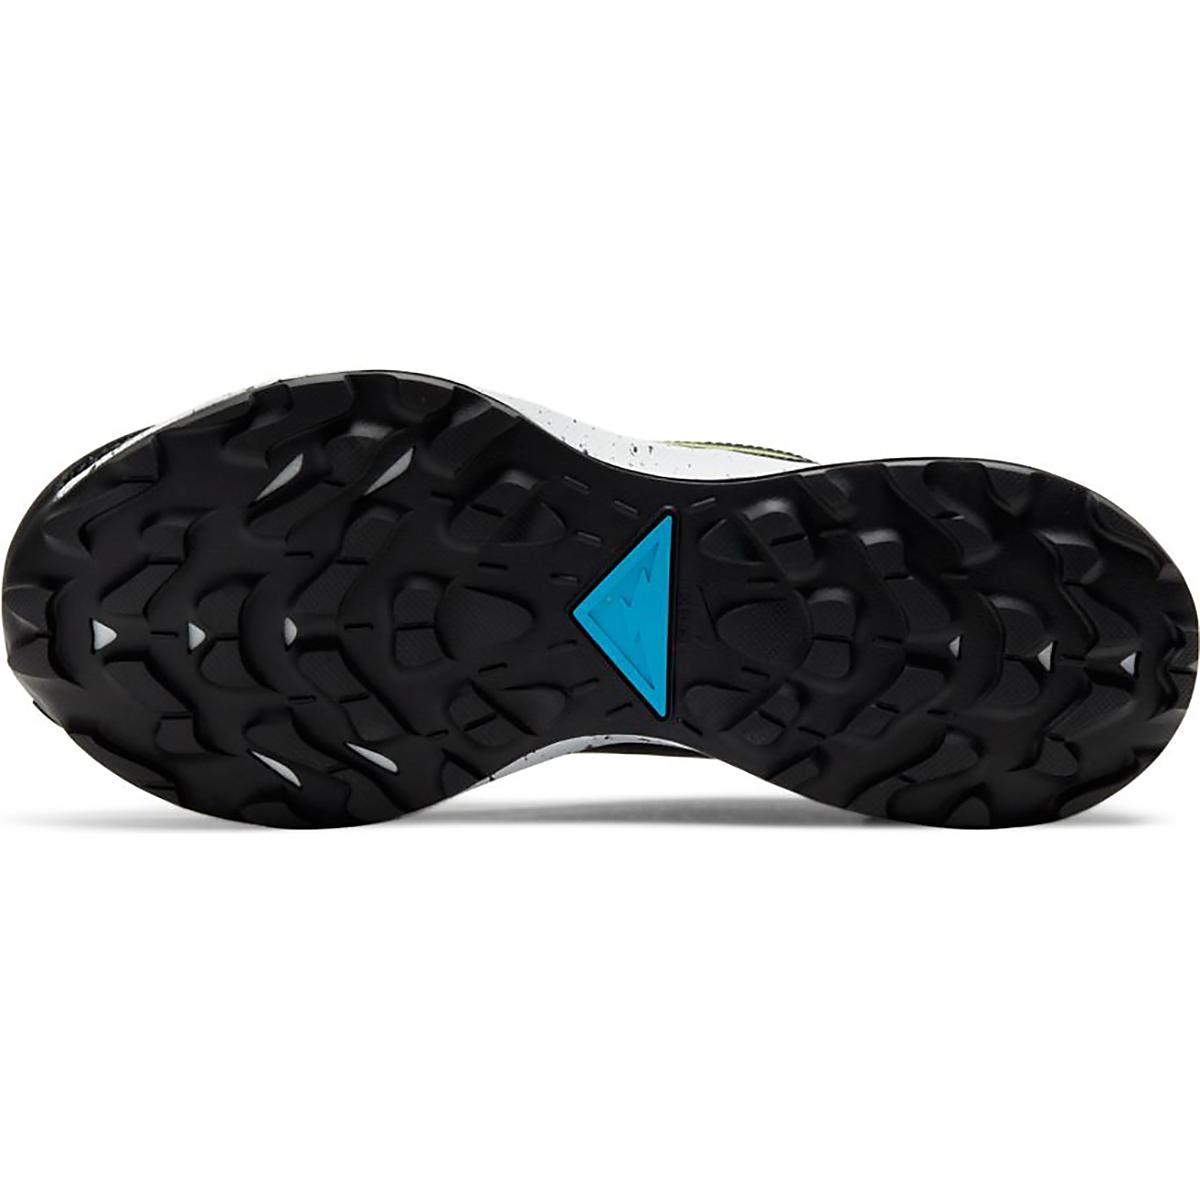 Women's Nike Pegasus Trail 2 Trail Running Shoe - Color: Off Noir/Limelight-Laser Blue - Size: 5 - Width: Regular, Off Noir/Limelight-Laser Blue, large, image 4